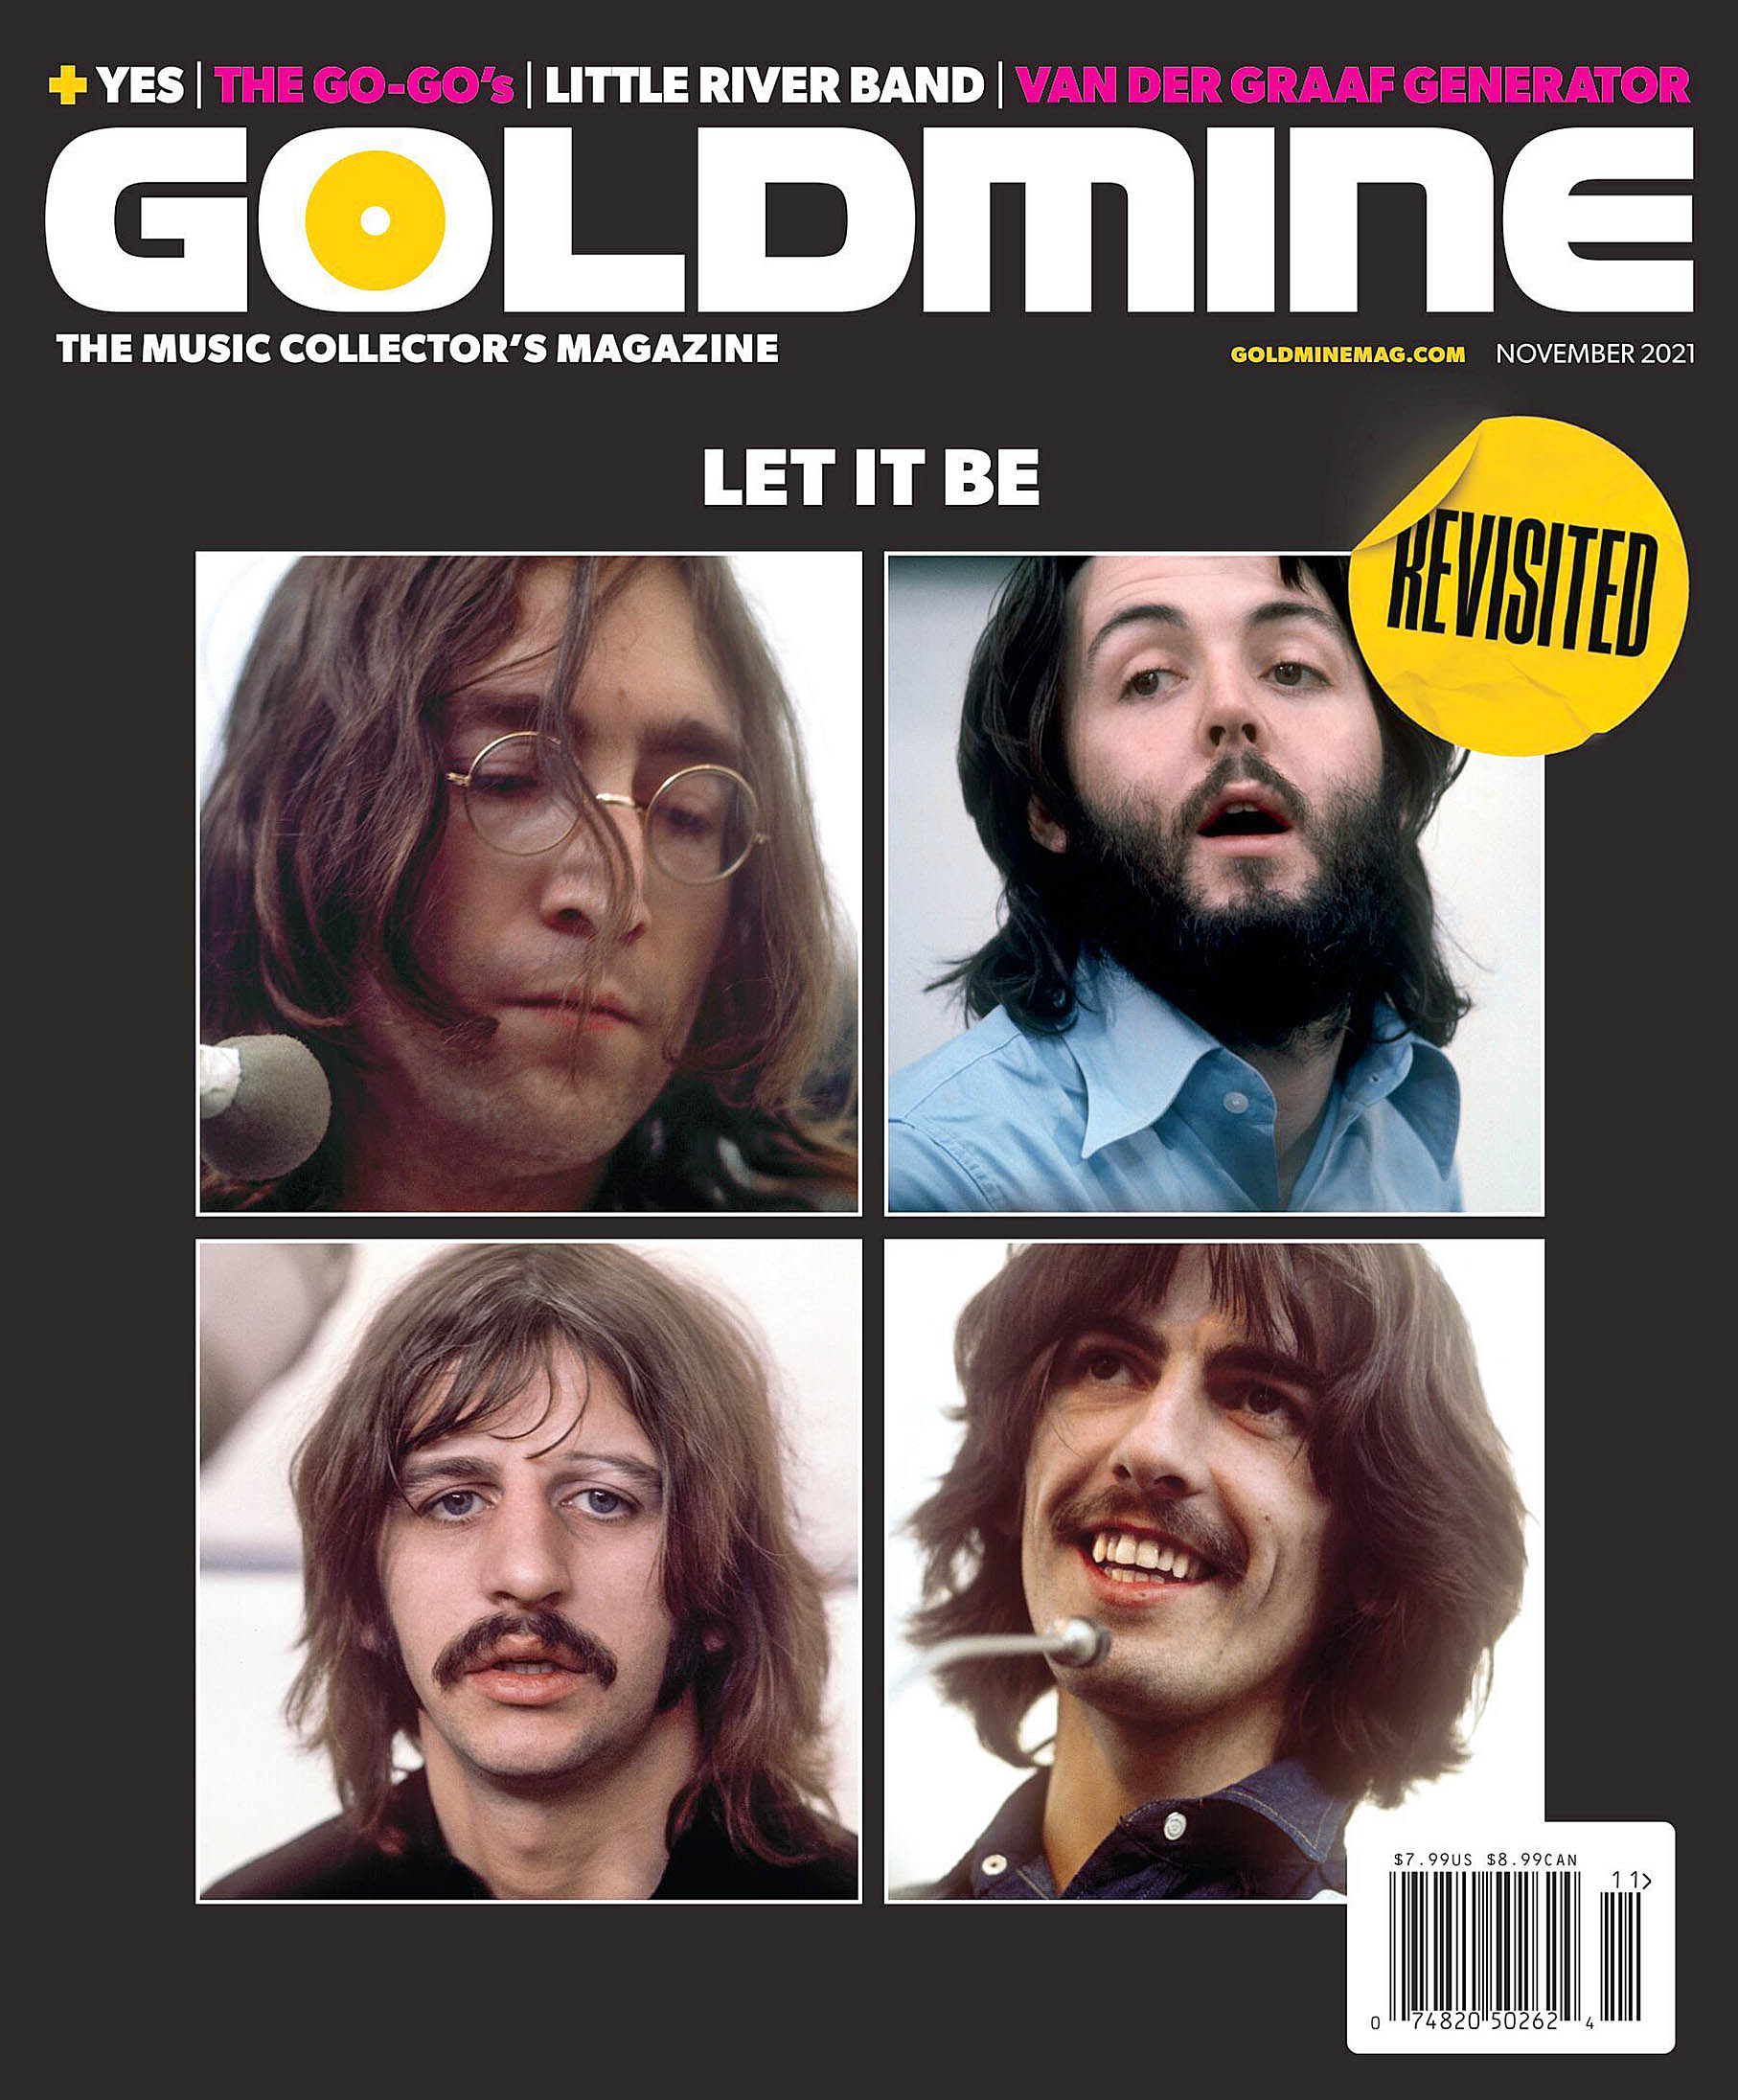 Goldmine 2021-11 Beatles 01.jpg